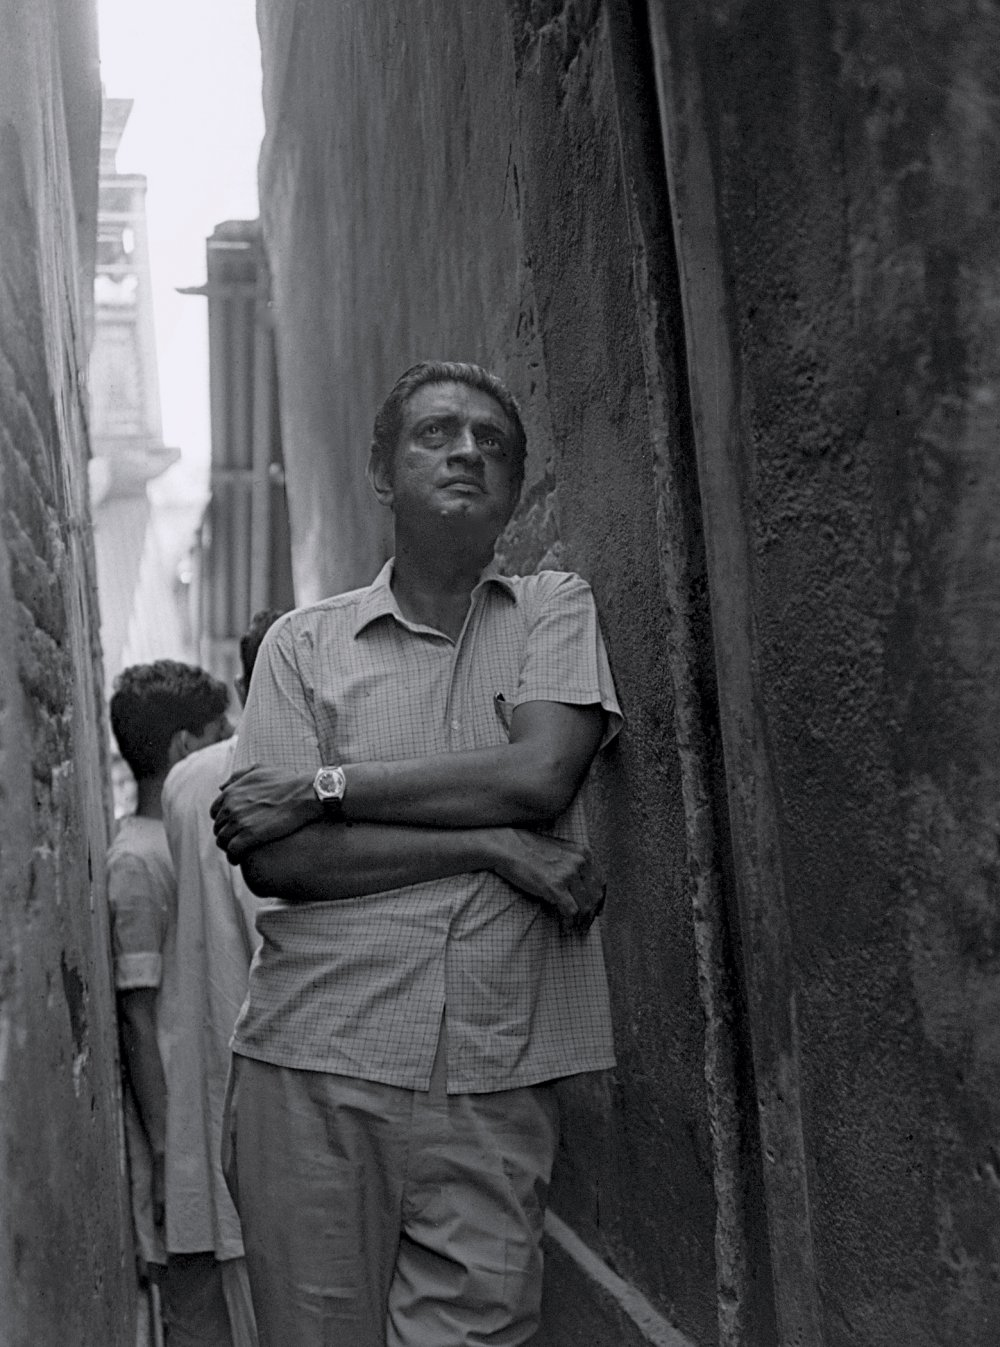 Satyajit Ray photographed by Nemai Ghosh on set of The Adversary (1970)